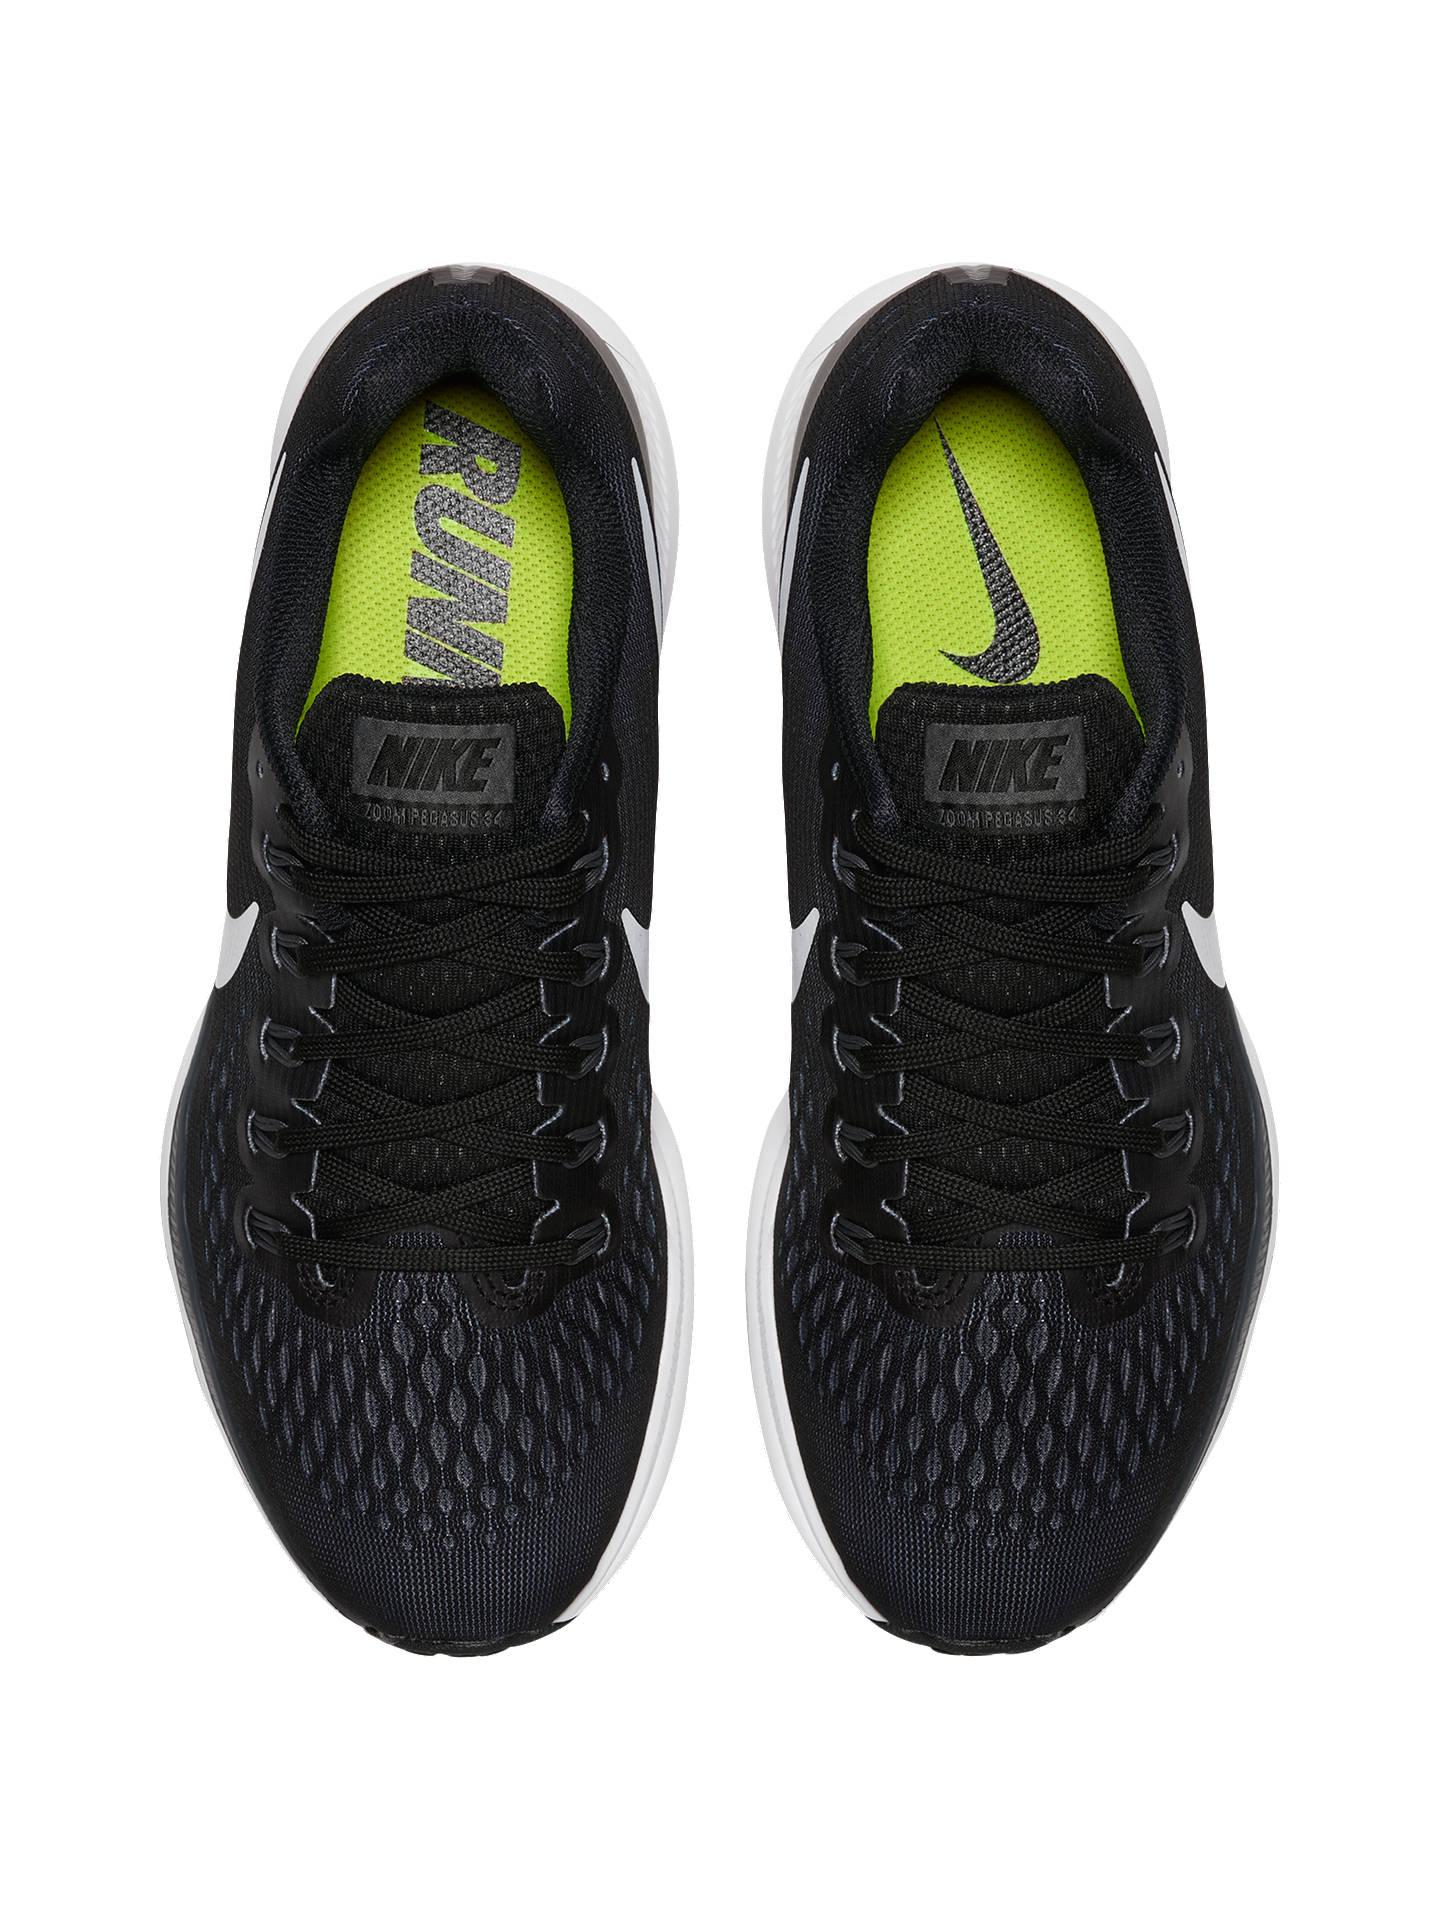 reputable site 1d685 a6d12 Nike Air Zoom Pegasus 34 Women's Running Shoes at John Lewis ...